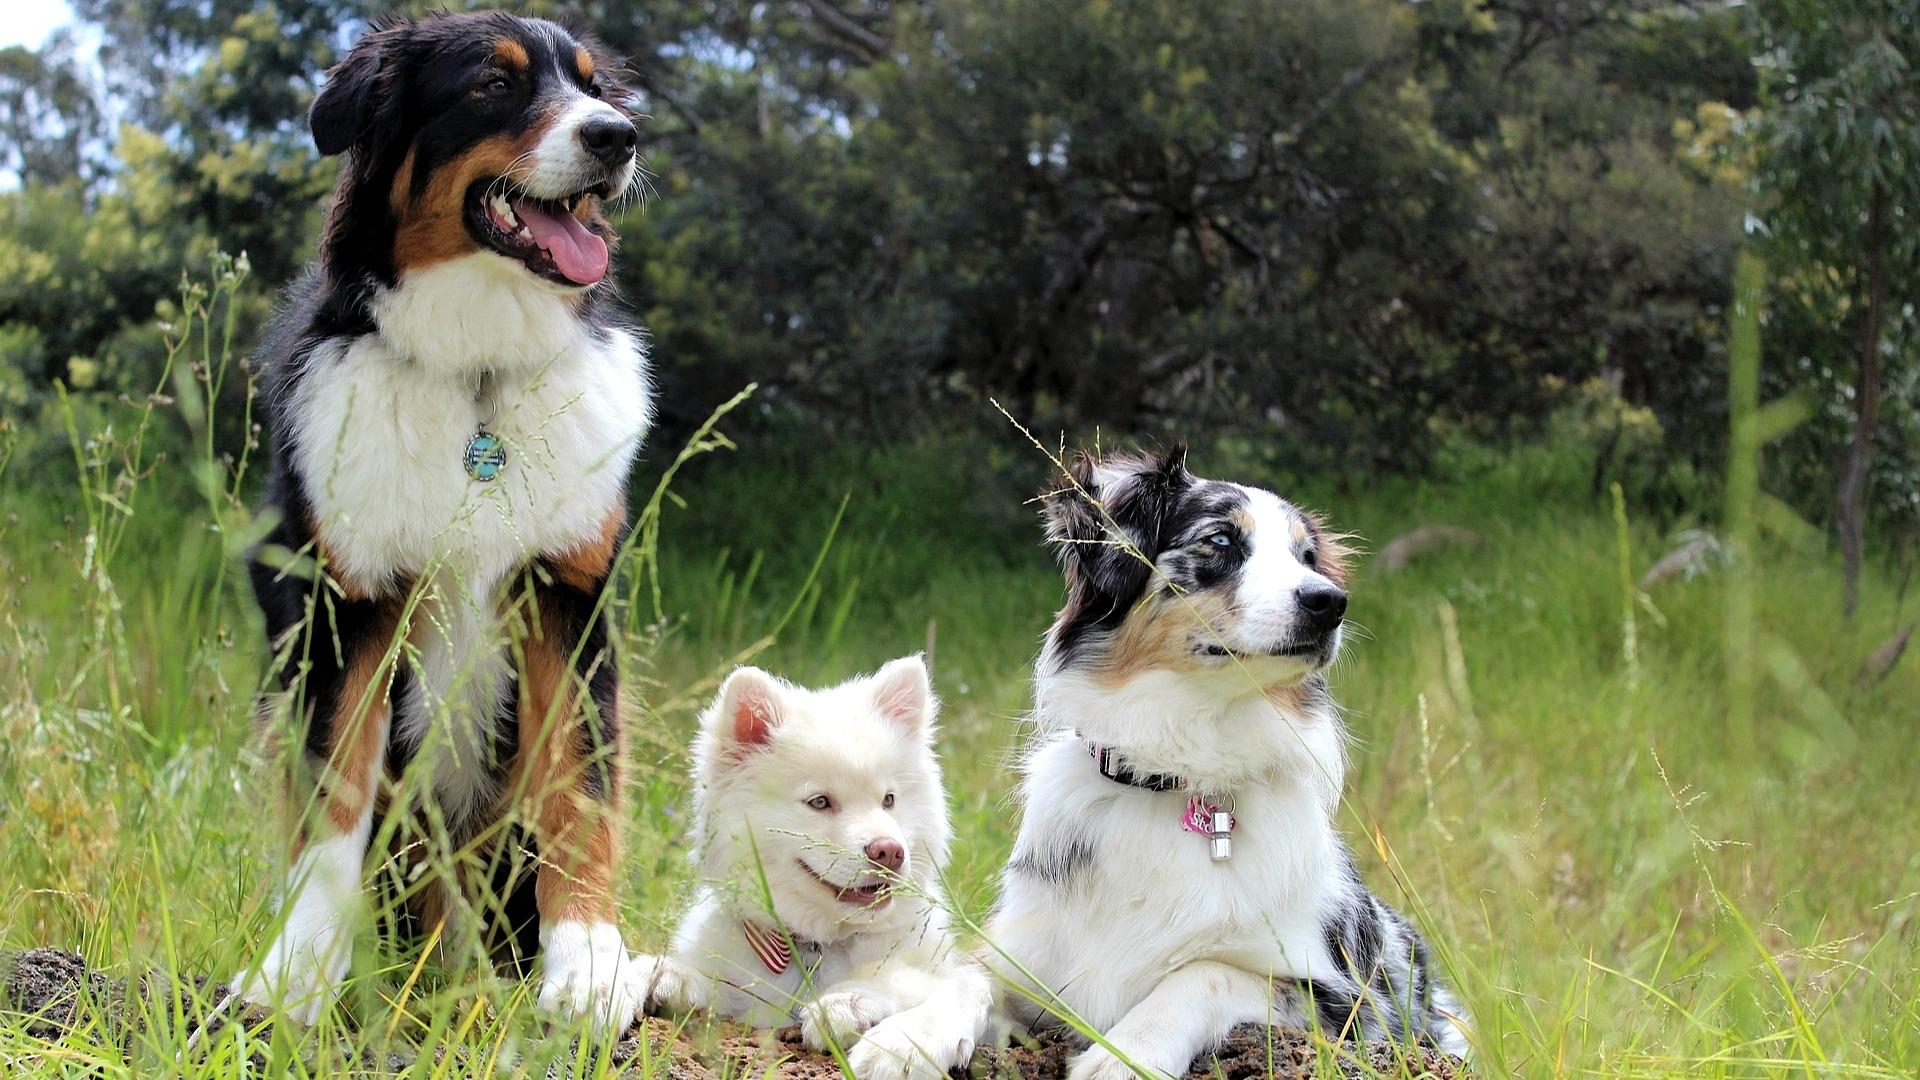 7dff32611a6 8 oblíbených psích plemen aneb 4 důvody